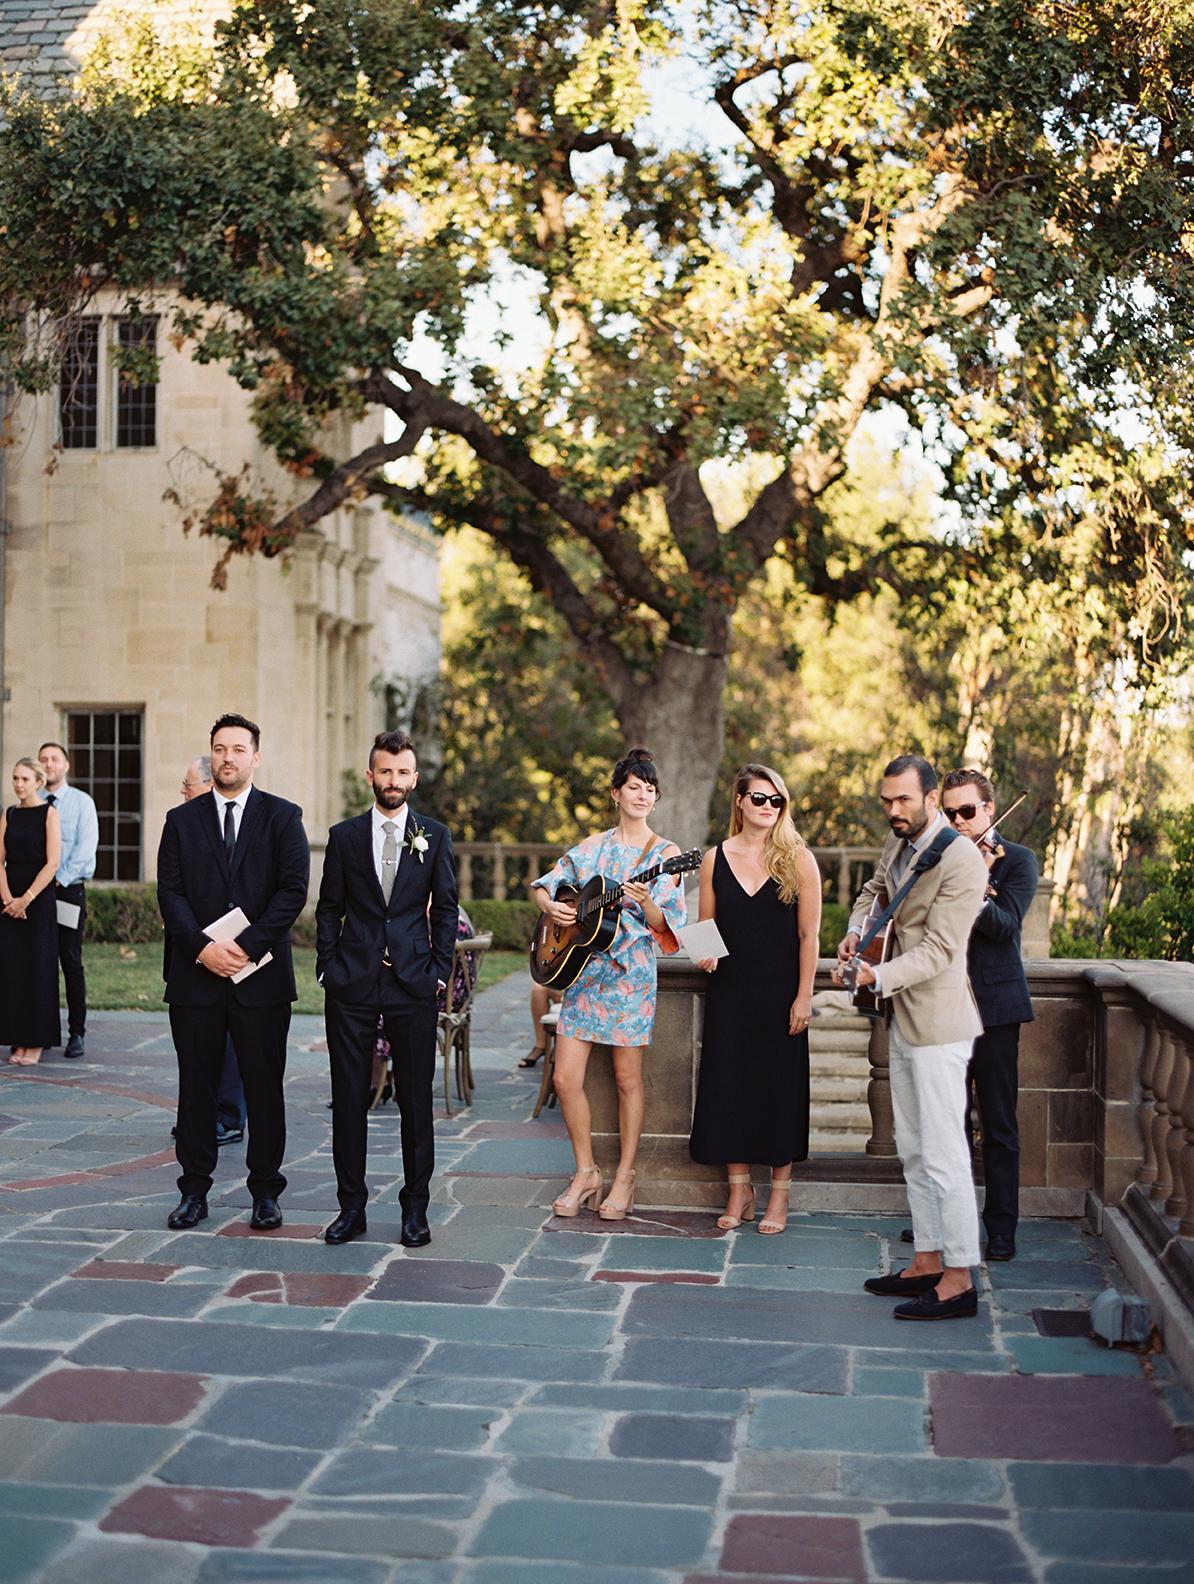 172-brian-sarra-los-angeles-wedding-brumley-wells-photography.jpg